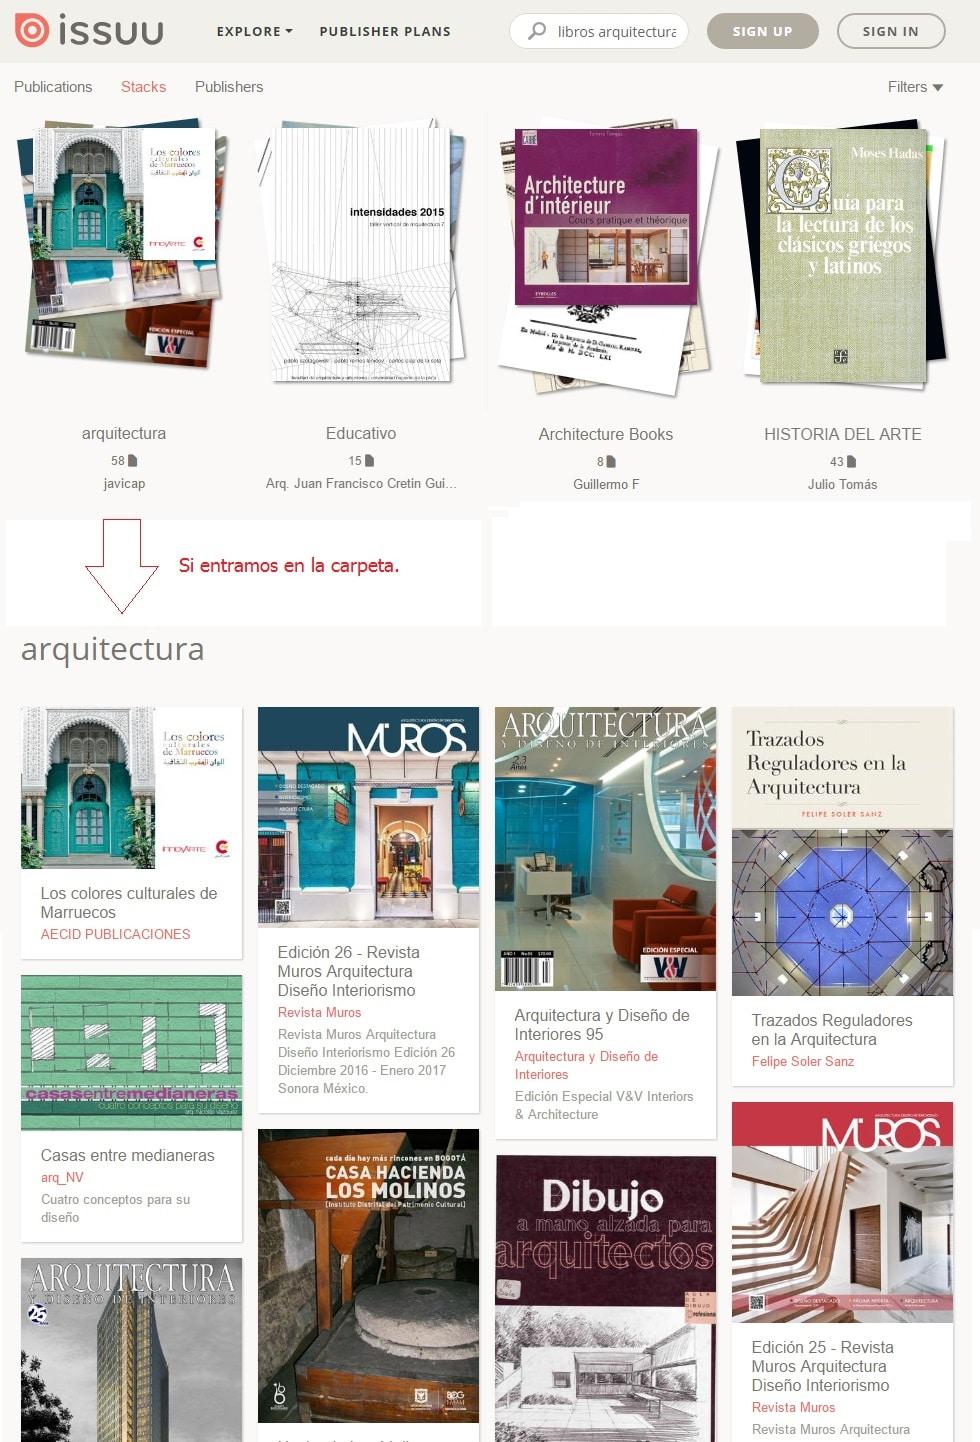 libros en arquitectura pdf